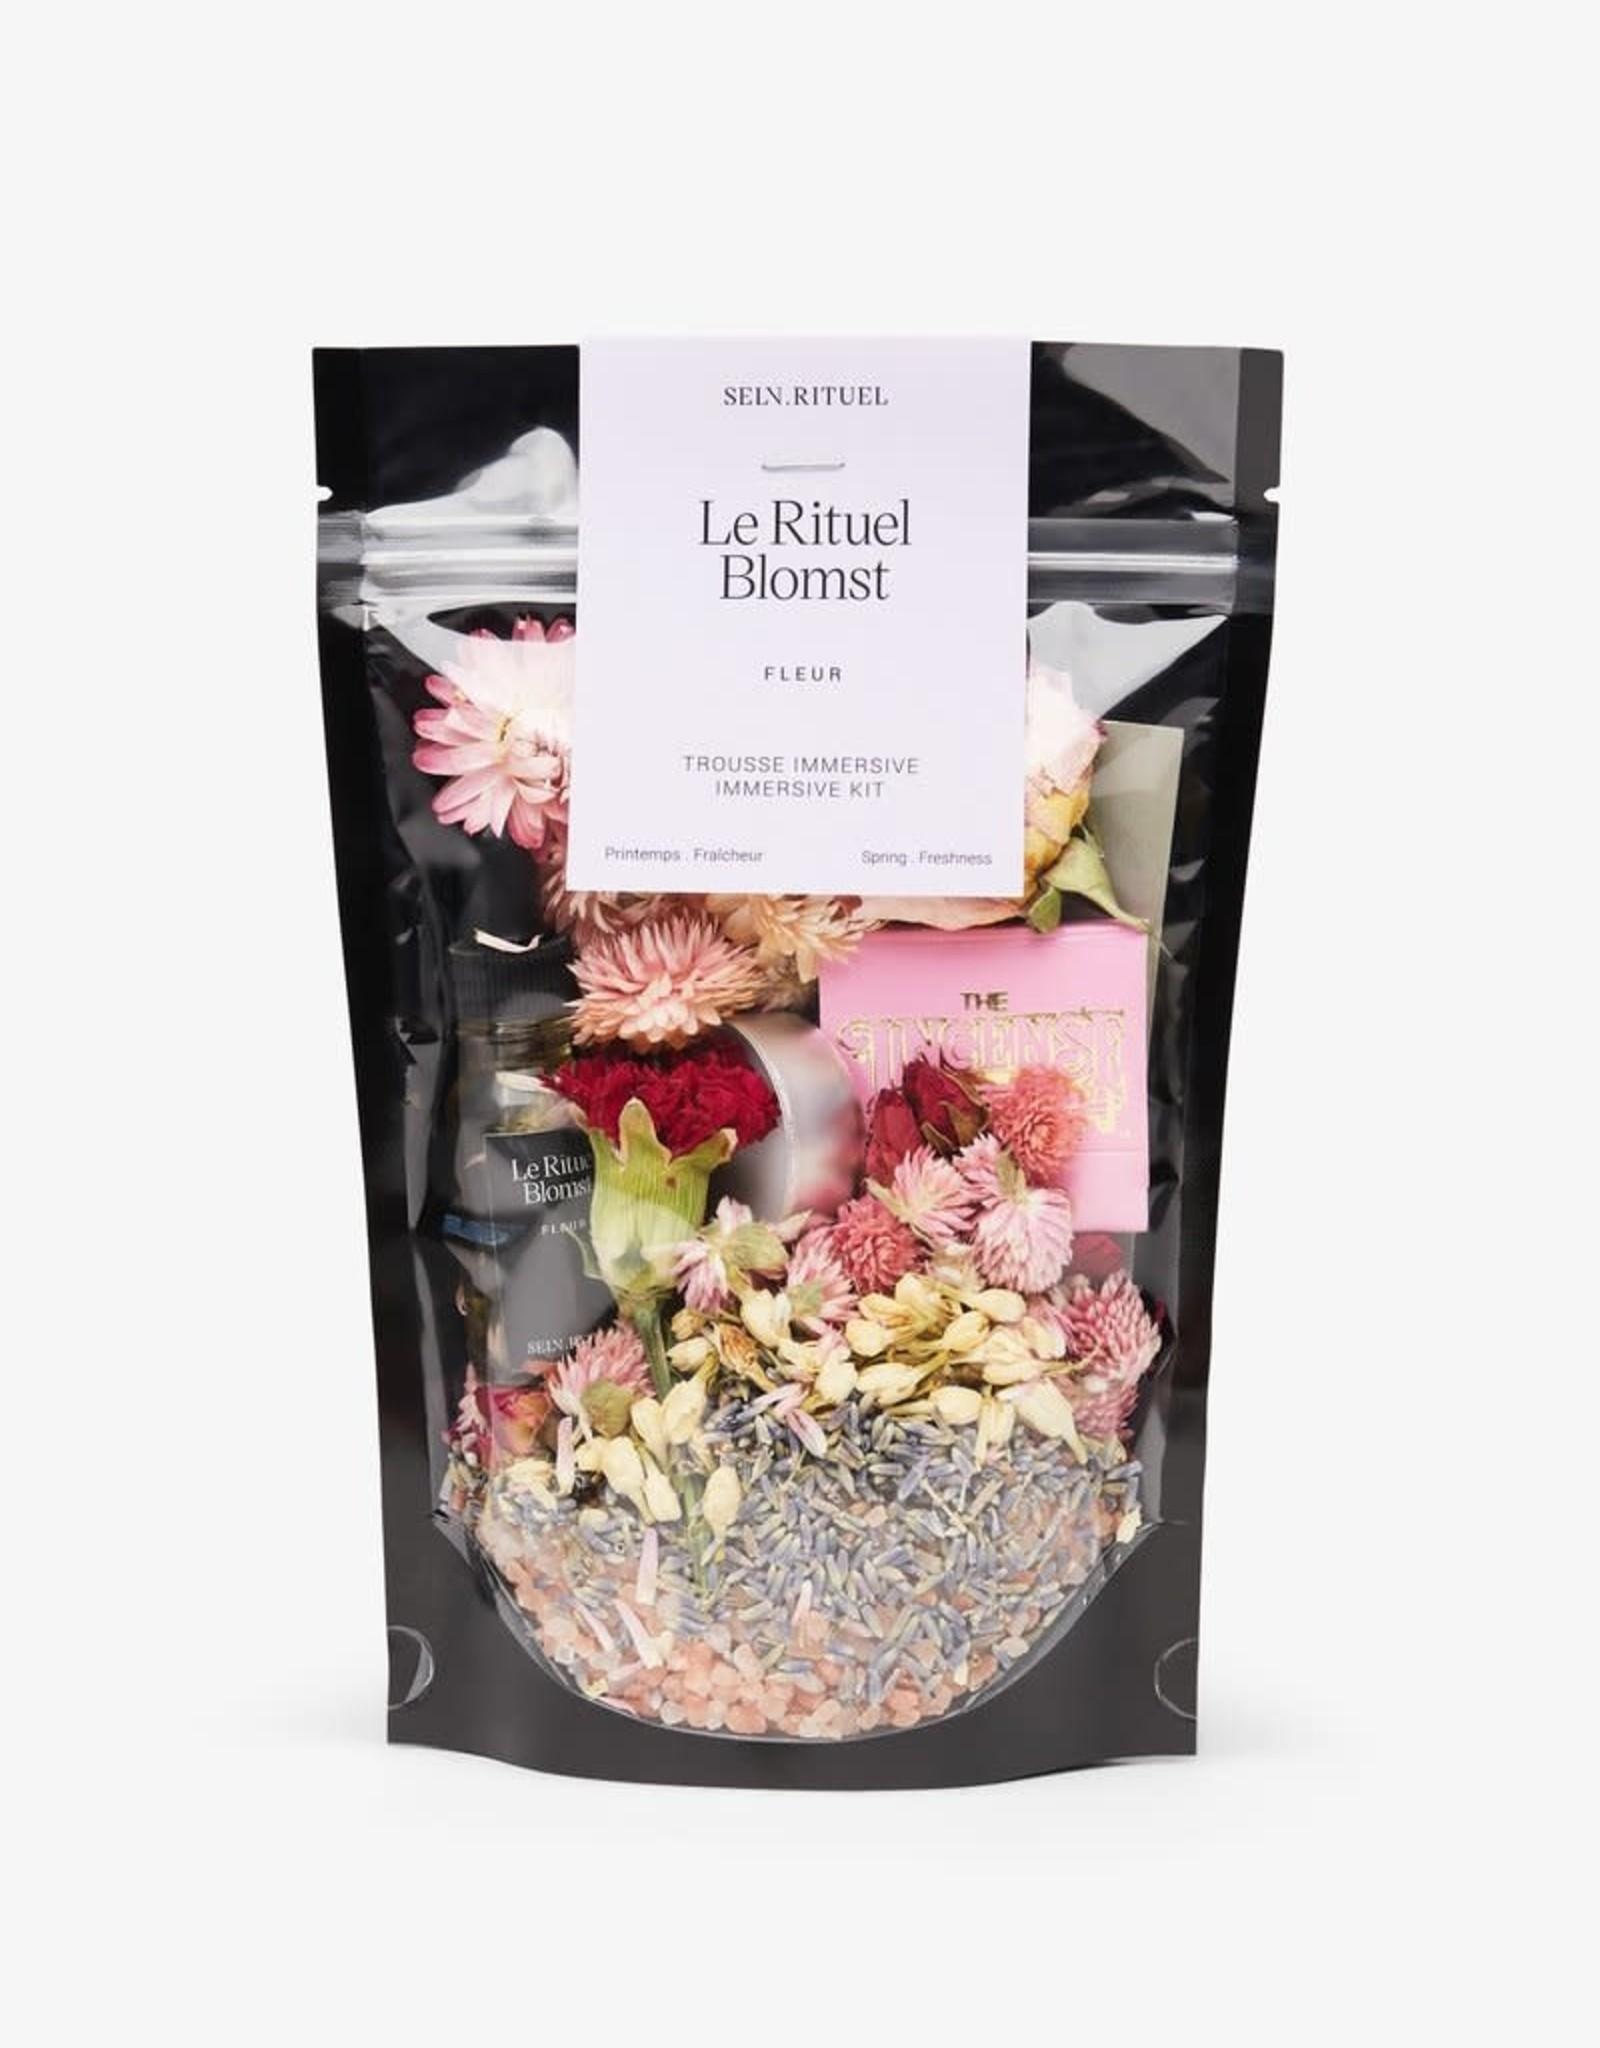 SELV.Rituel Le Rituel : Blomst